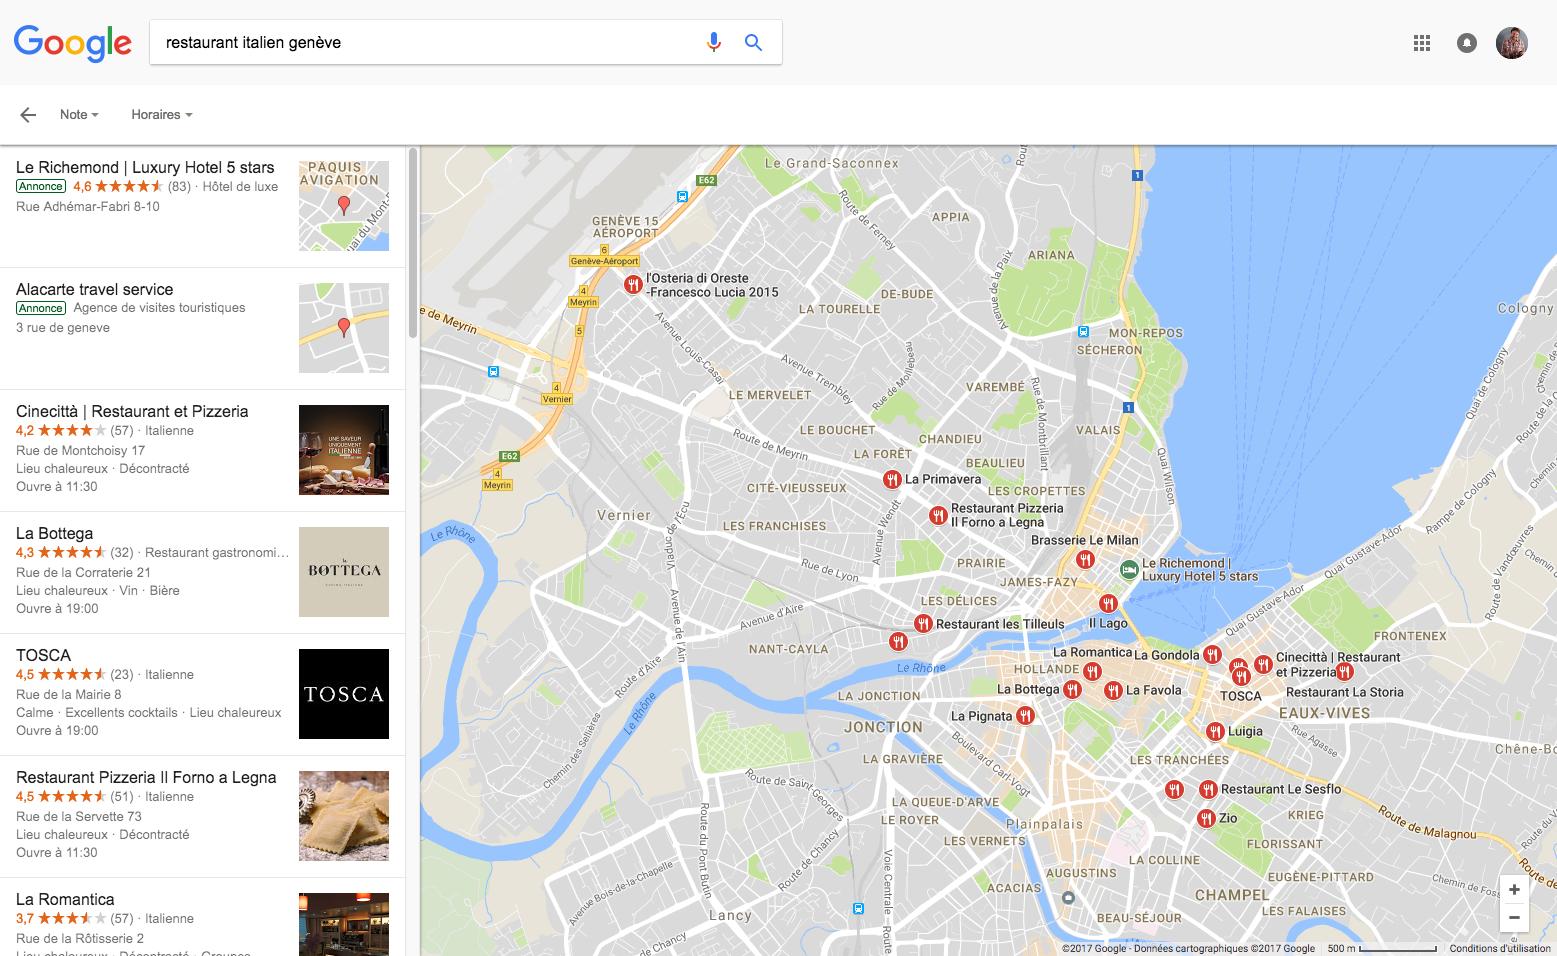 recherche locale restaurant italien genève - google my business